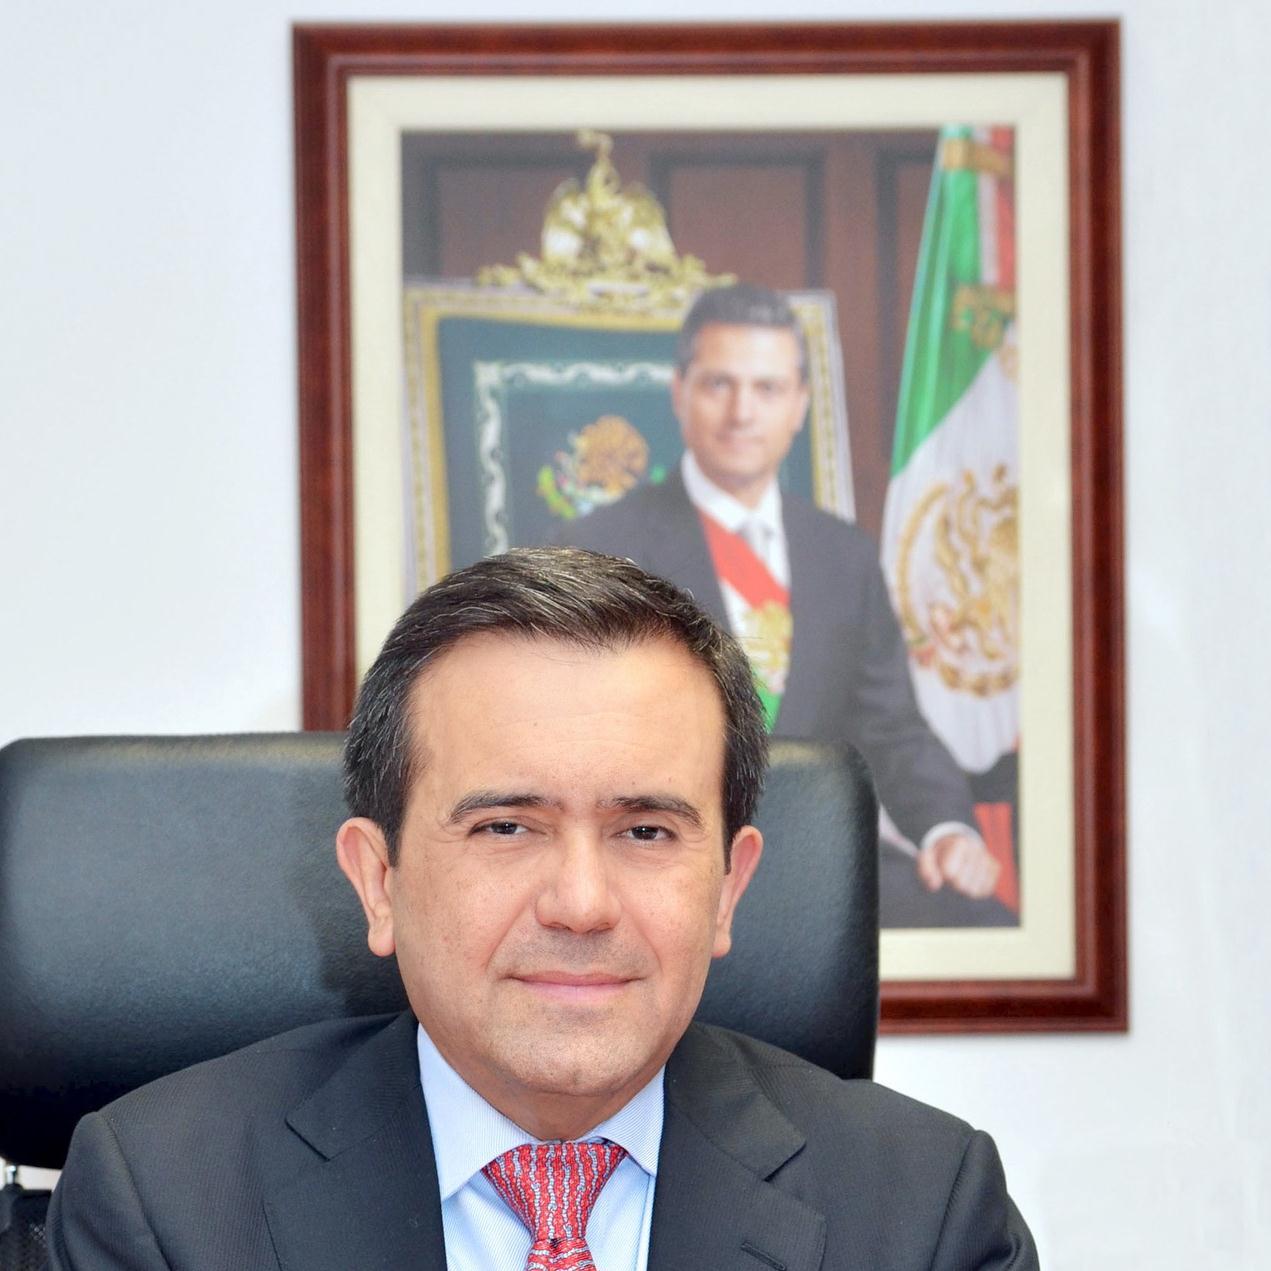 Ildefonso Guajardo Villarreal Pic.jpg